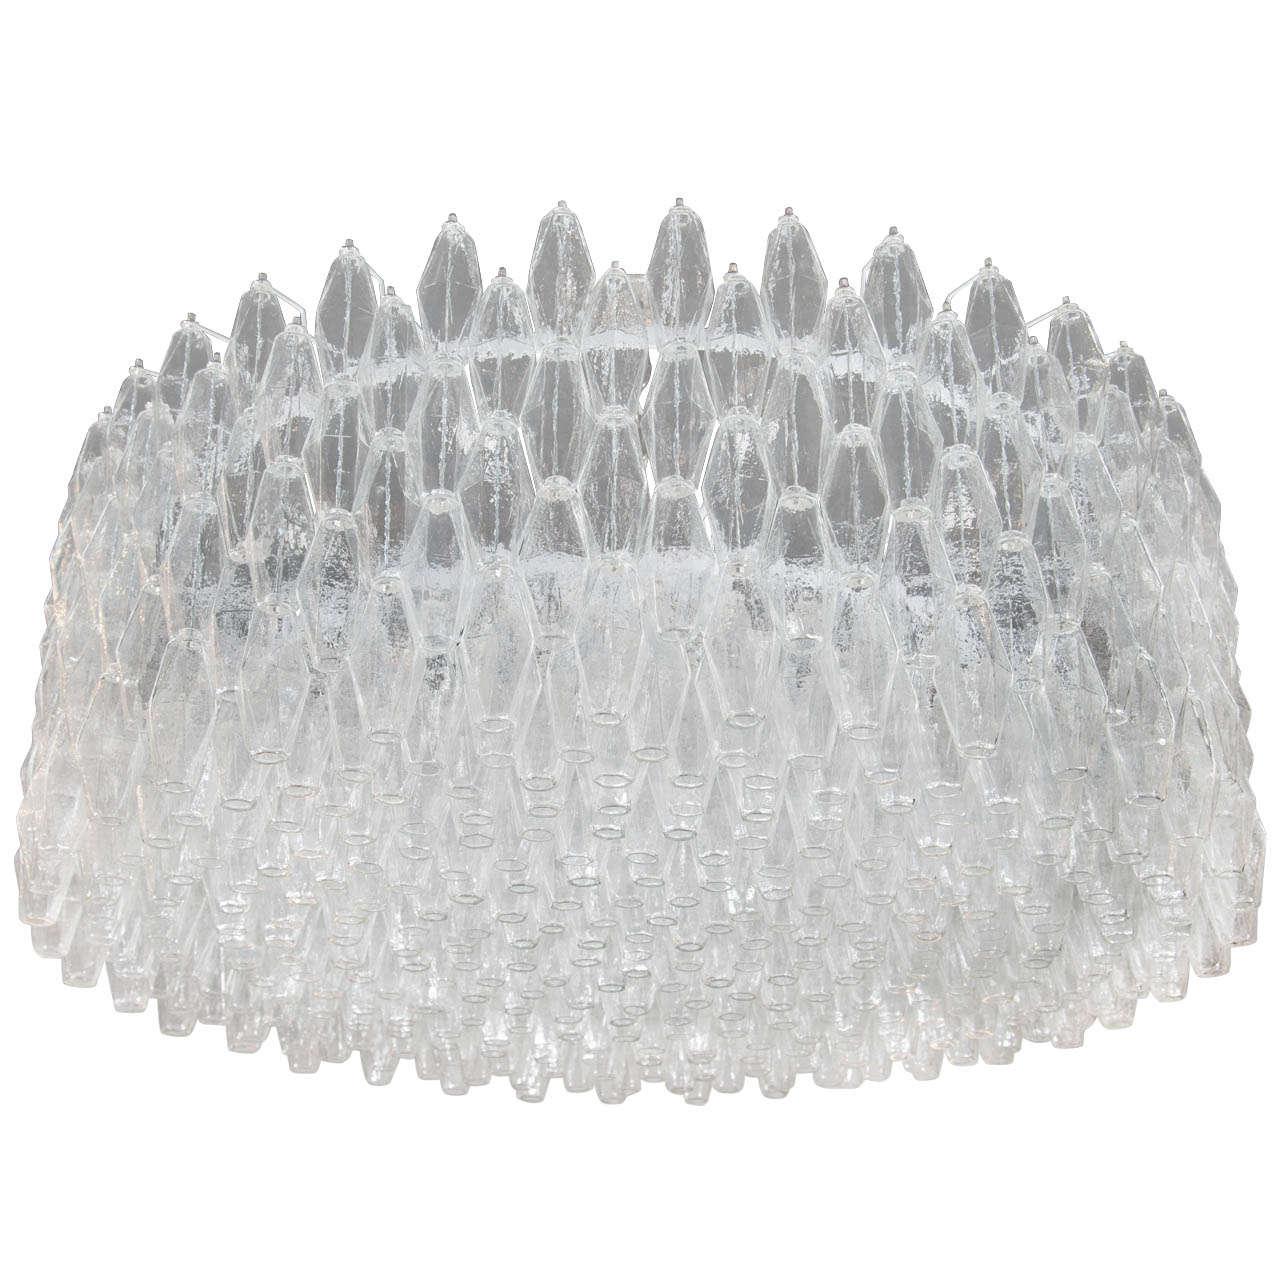 Monumental Handblown Smoked Murano Glass Polyhedral Chandelier by Venini 1